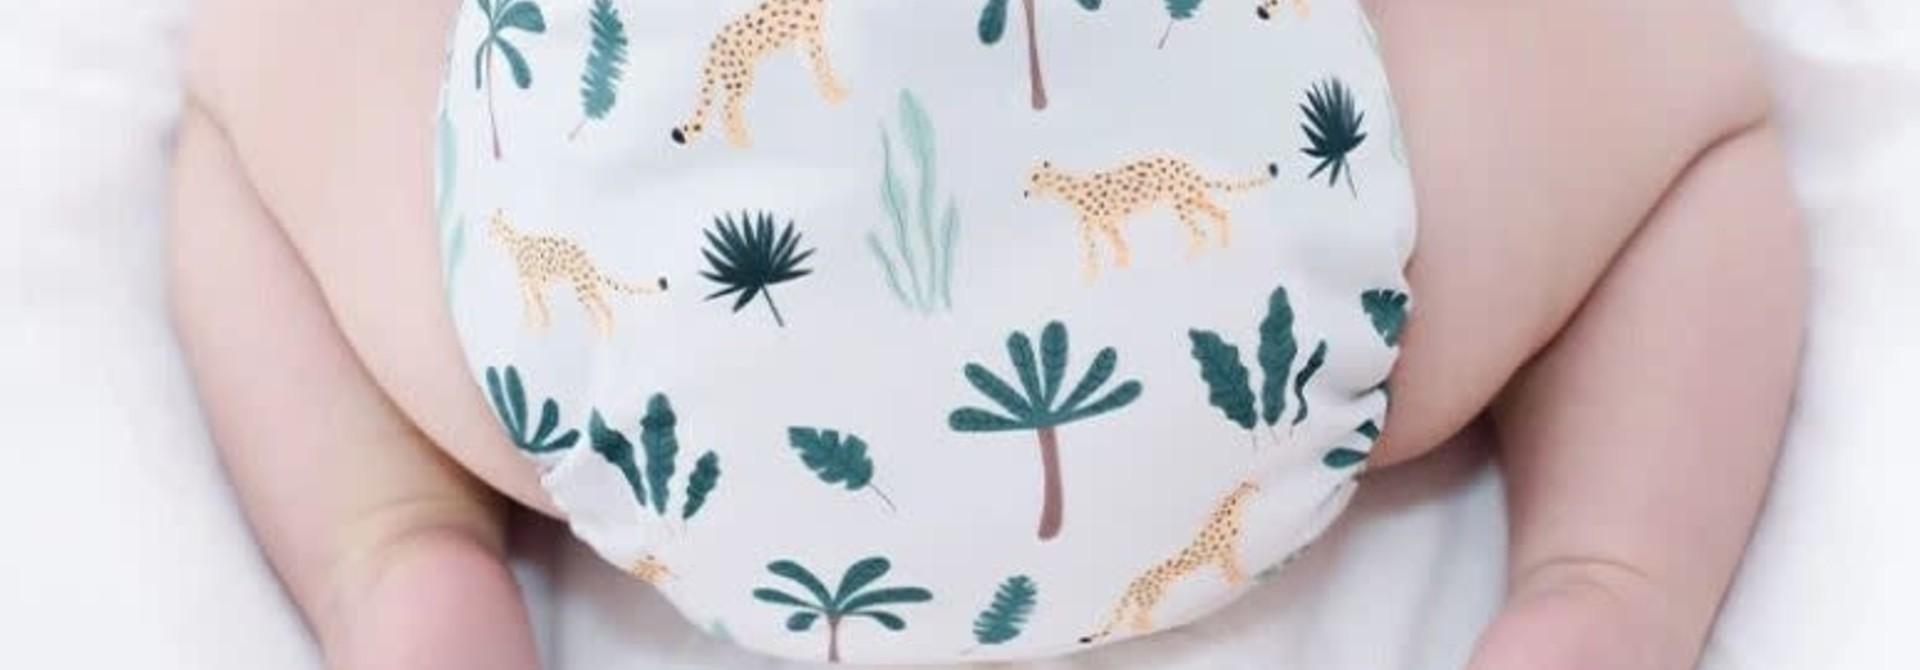 Couche à poche -  Leopard